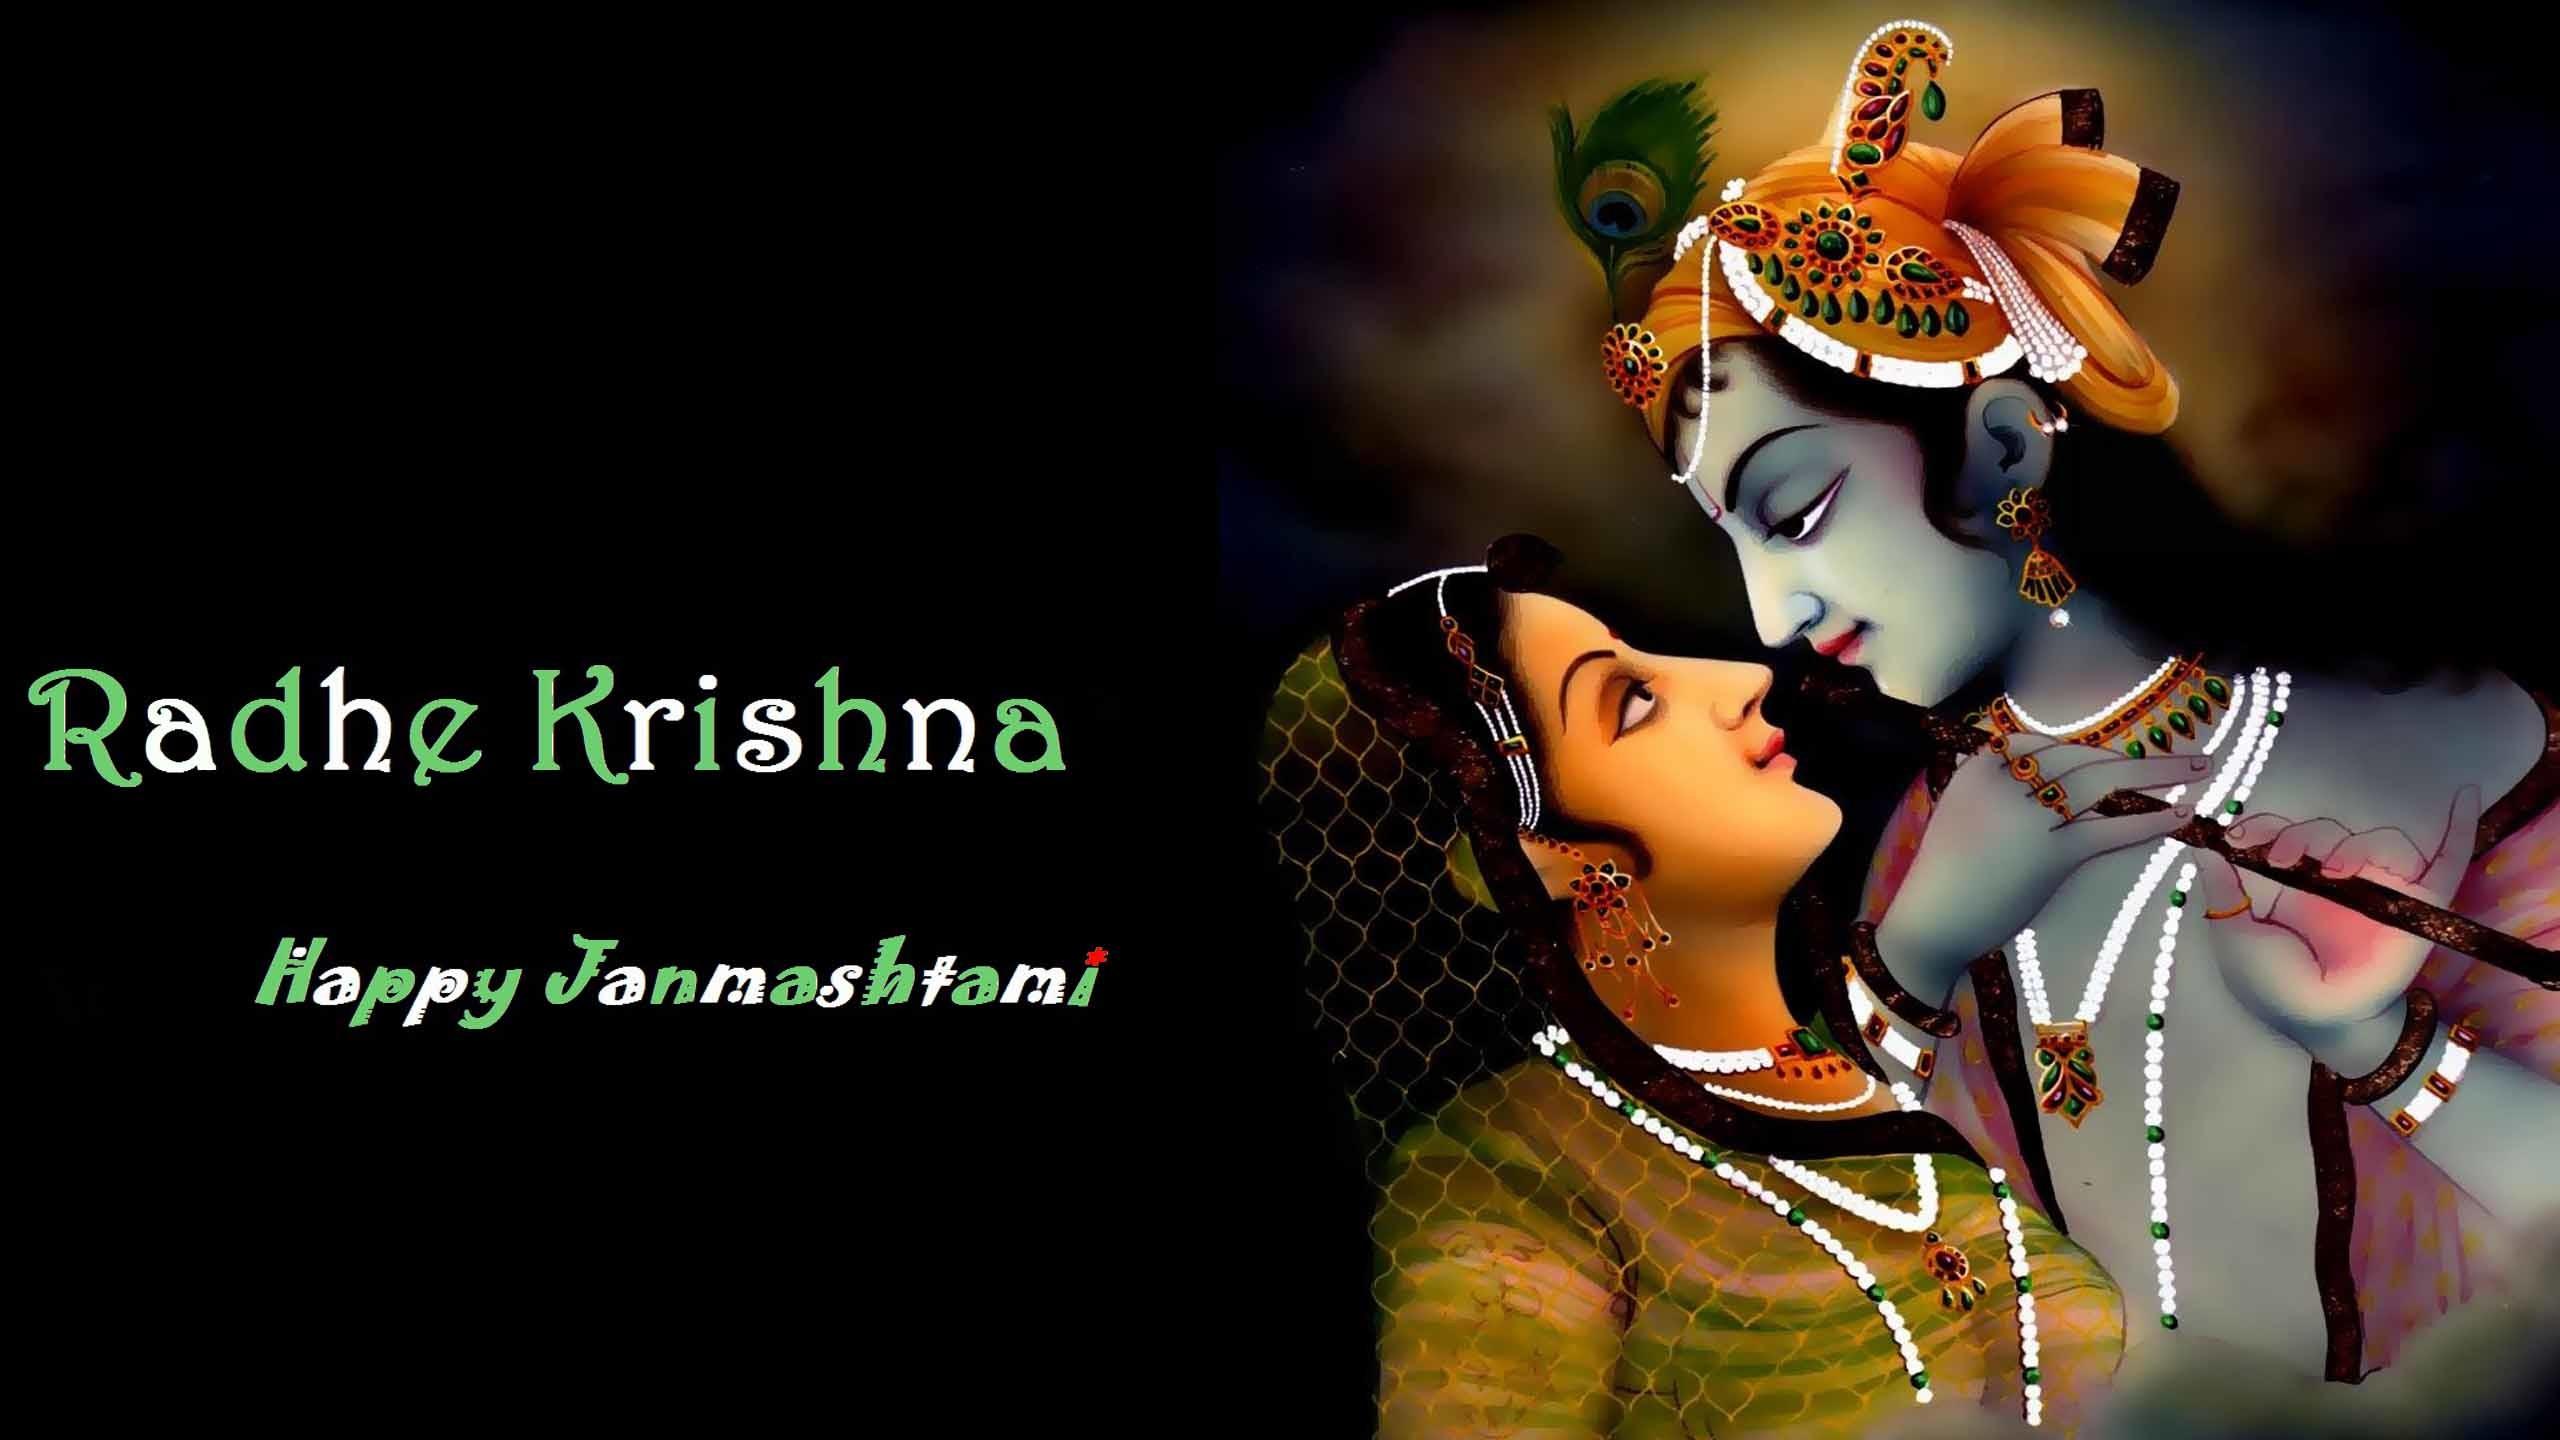 Janmashtami 2018   Data-src /w/full/2/d/5/469700 - Radha Krishna Happy Janmashtami Images Hd - HD Wallpaper